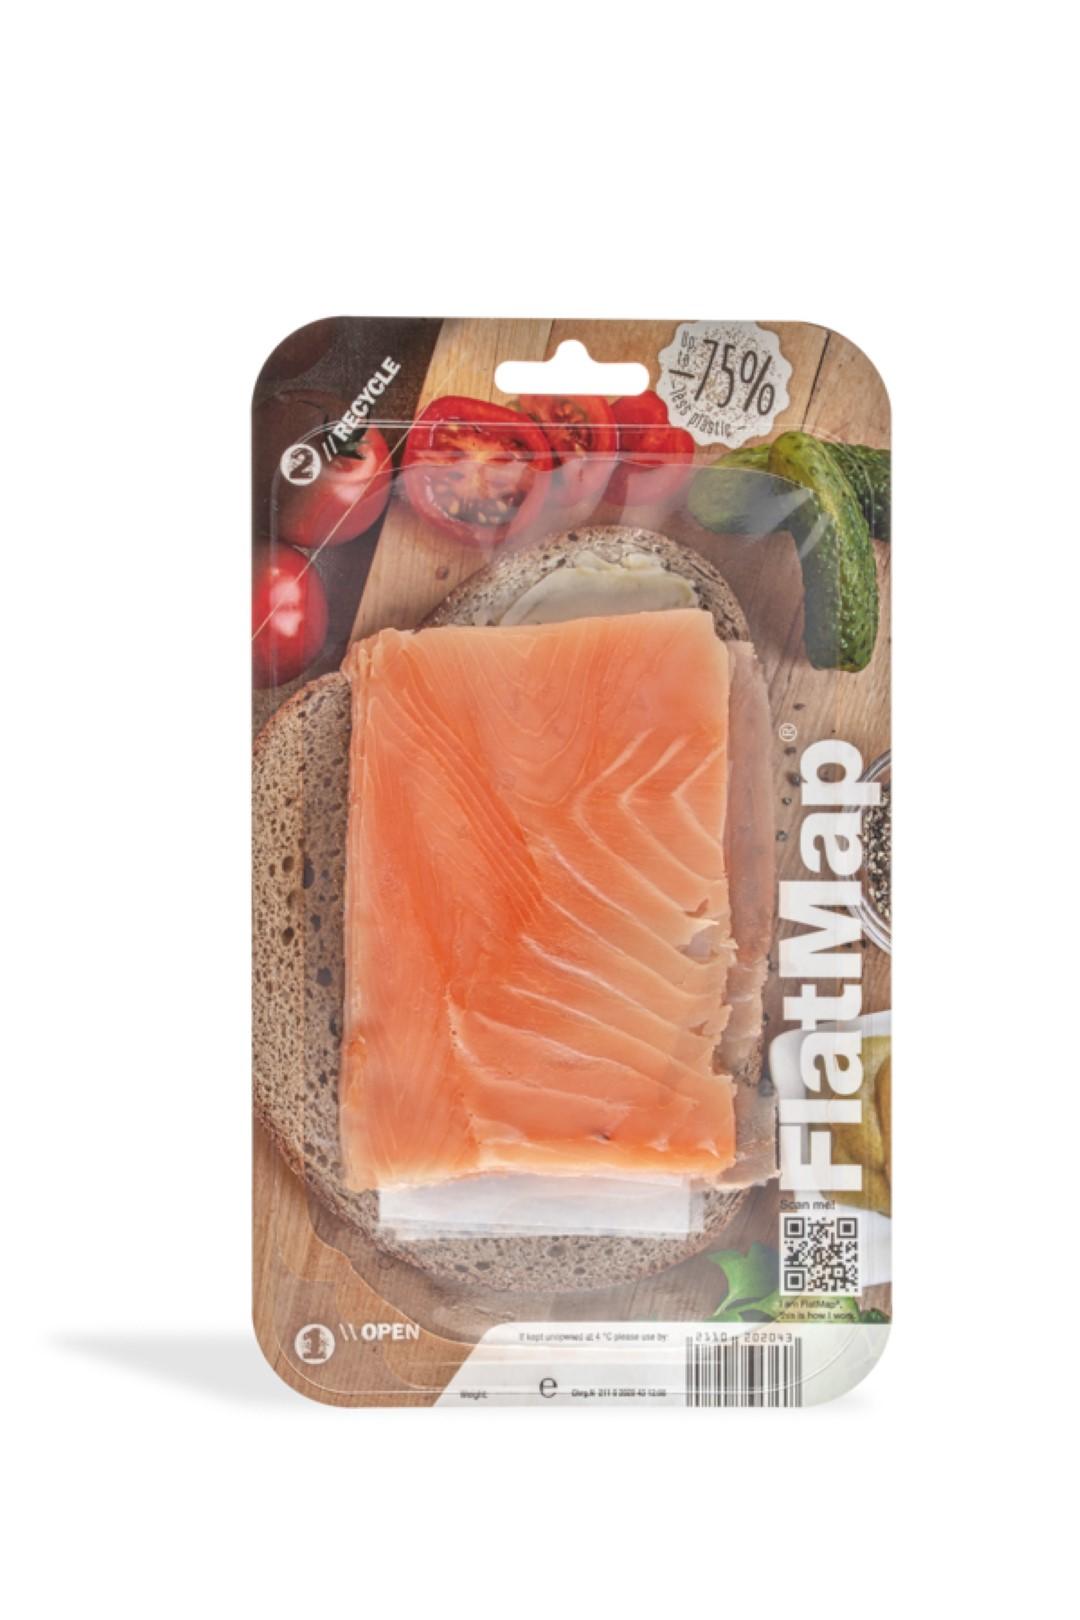 FlatMap seafood